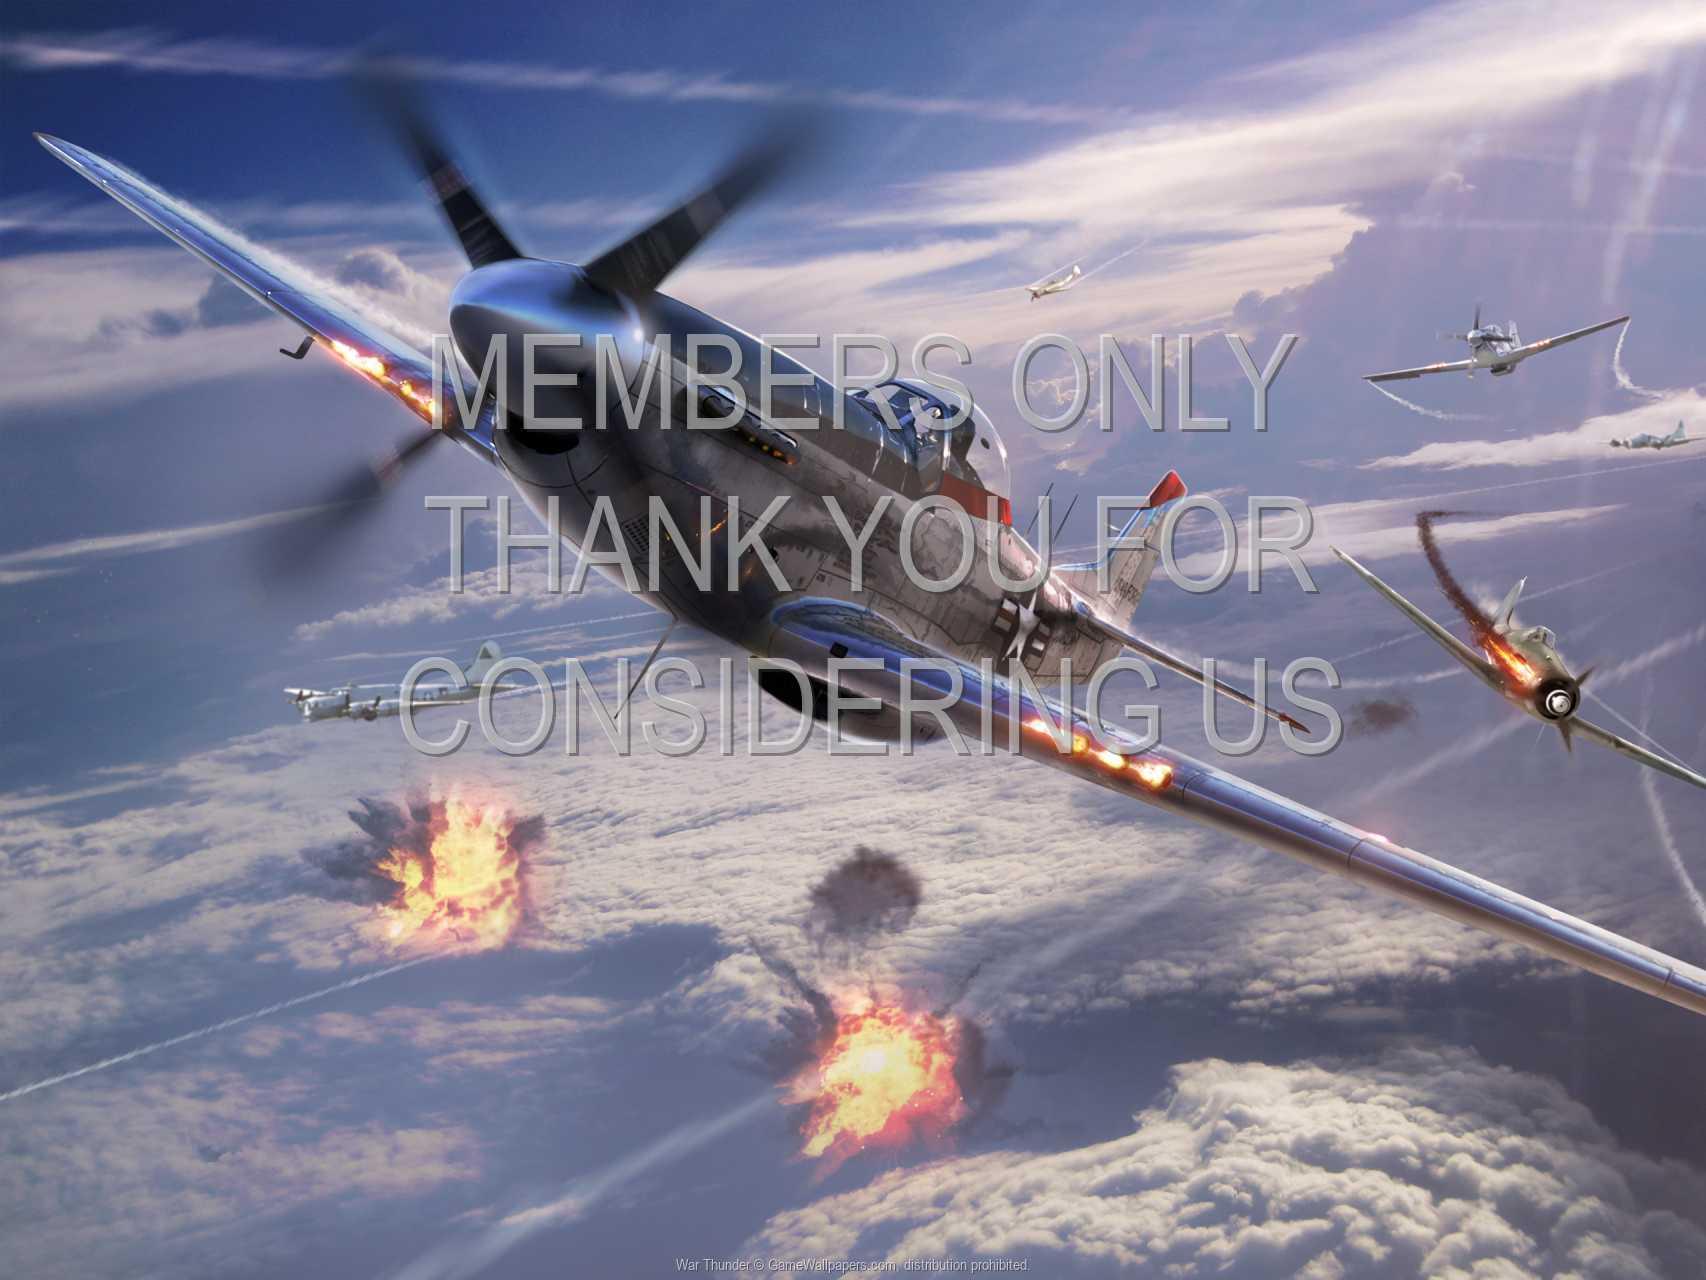 War Thunder 720p Horizontal Mobile wallpaper or background 01